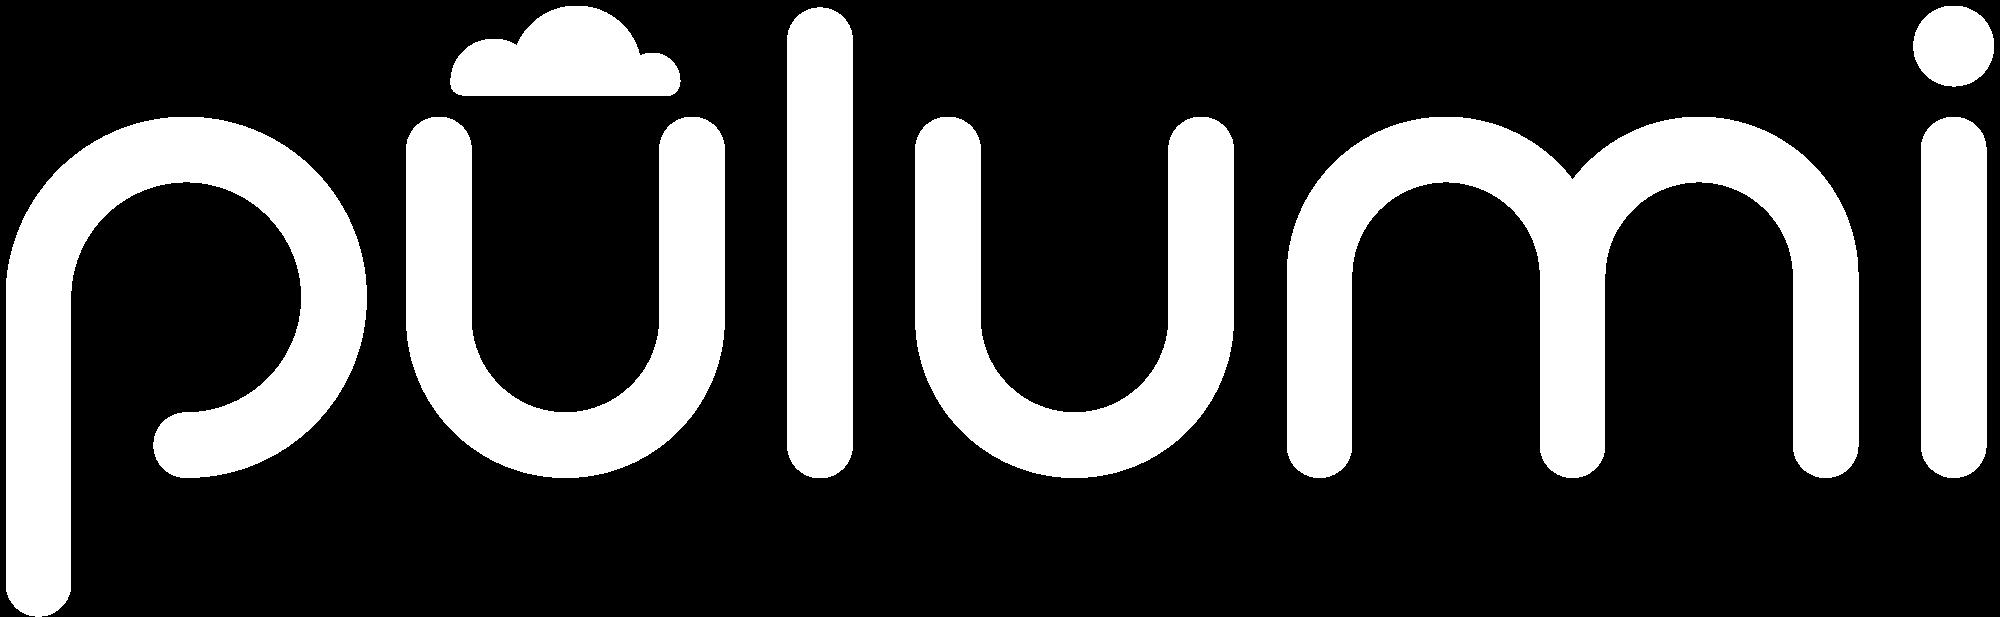 Pulumi